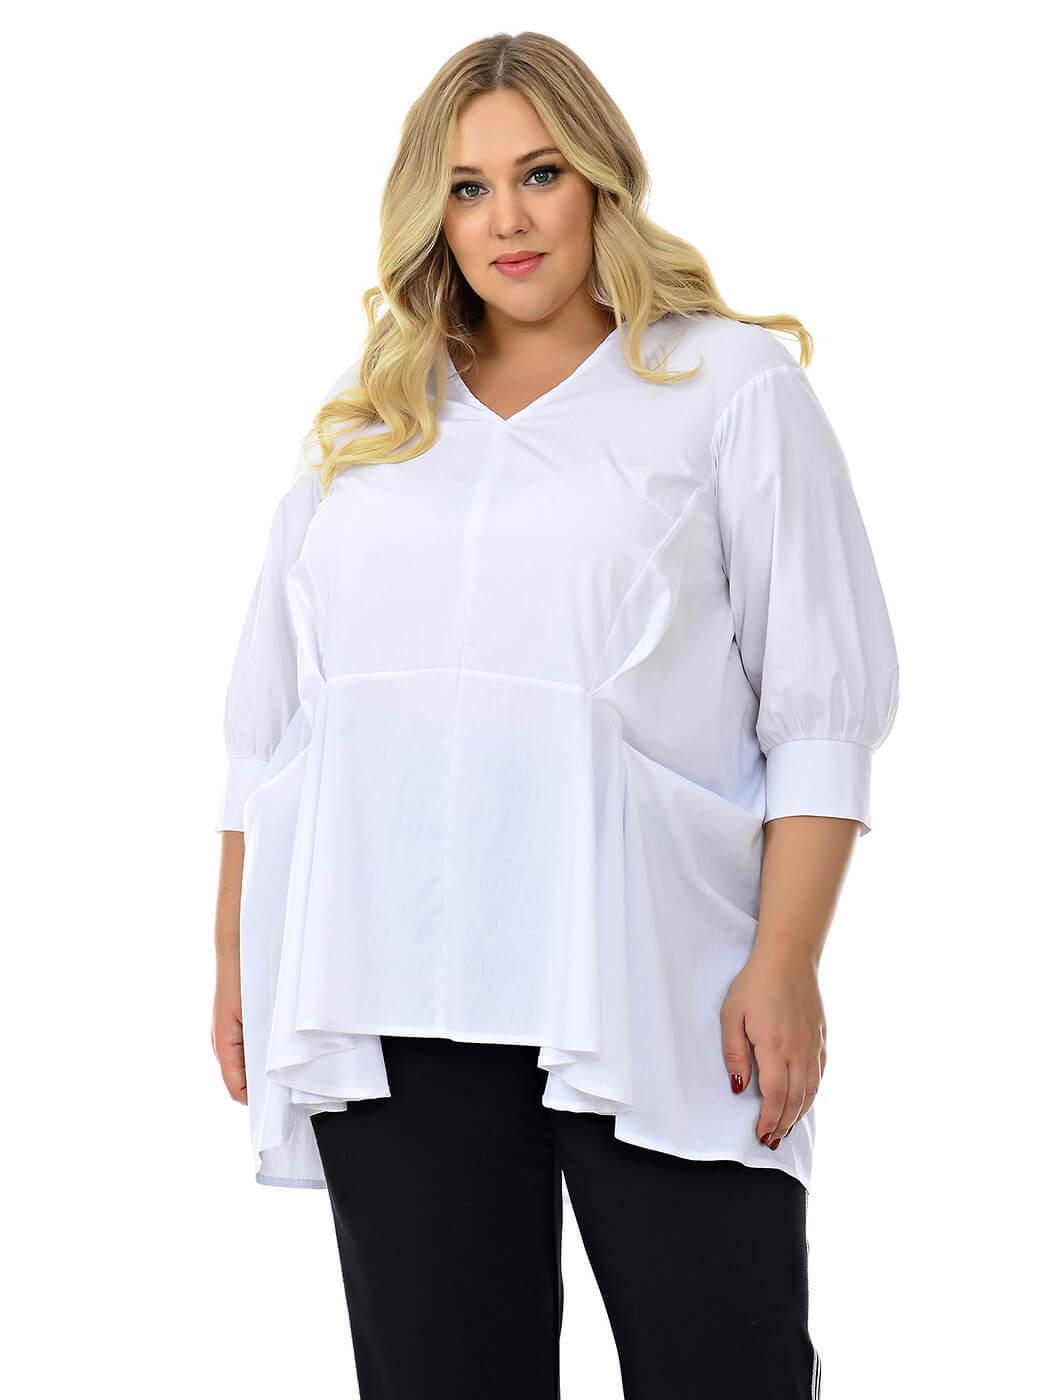 Белая офисная блузка 74 размера